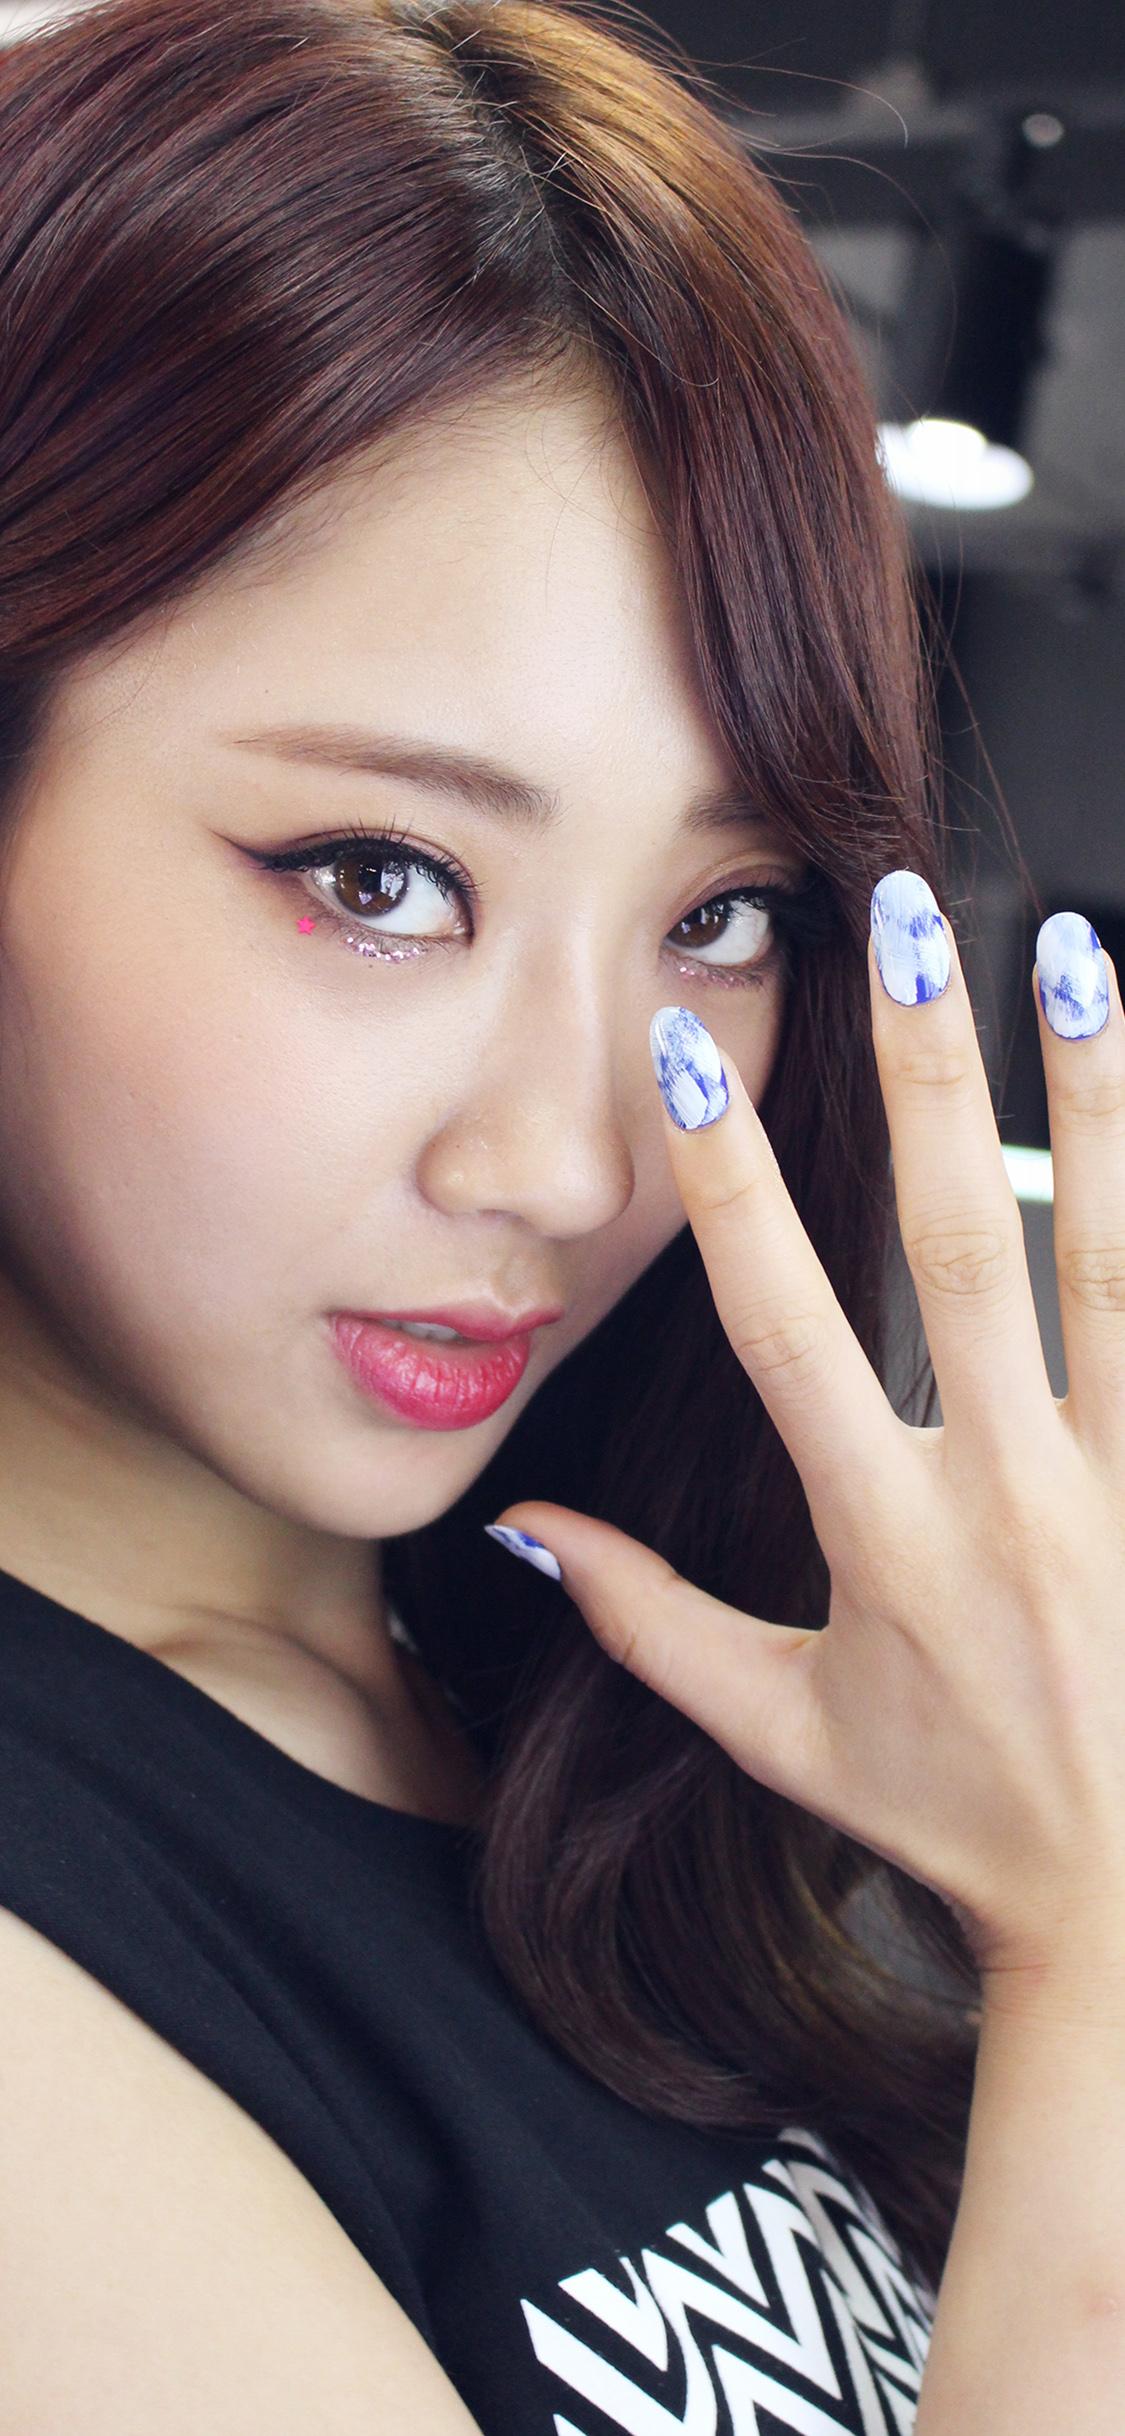 iPhoneXpapers.com-Apple-iPhone-wallpaper-hj66-kyungli-kpop-girl-nail-cute